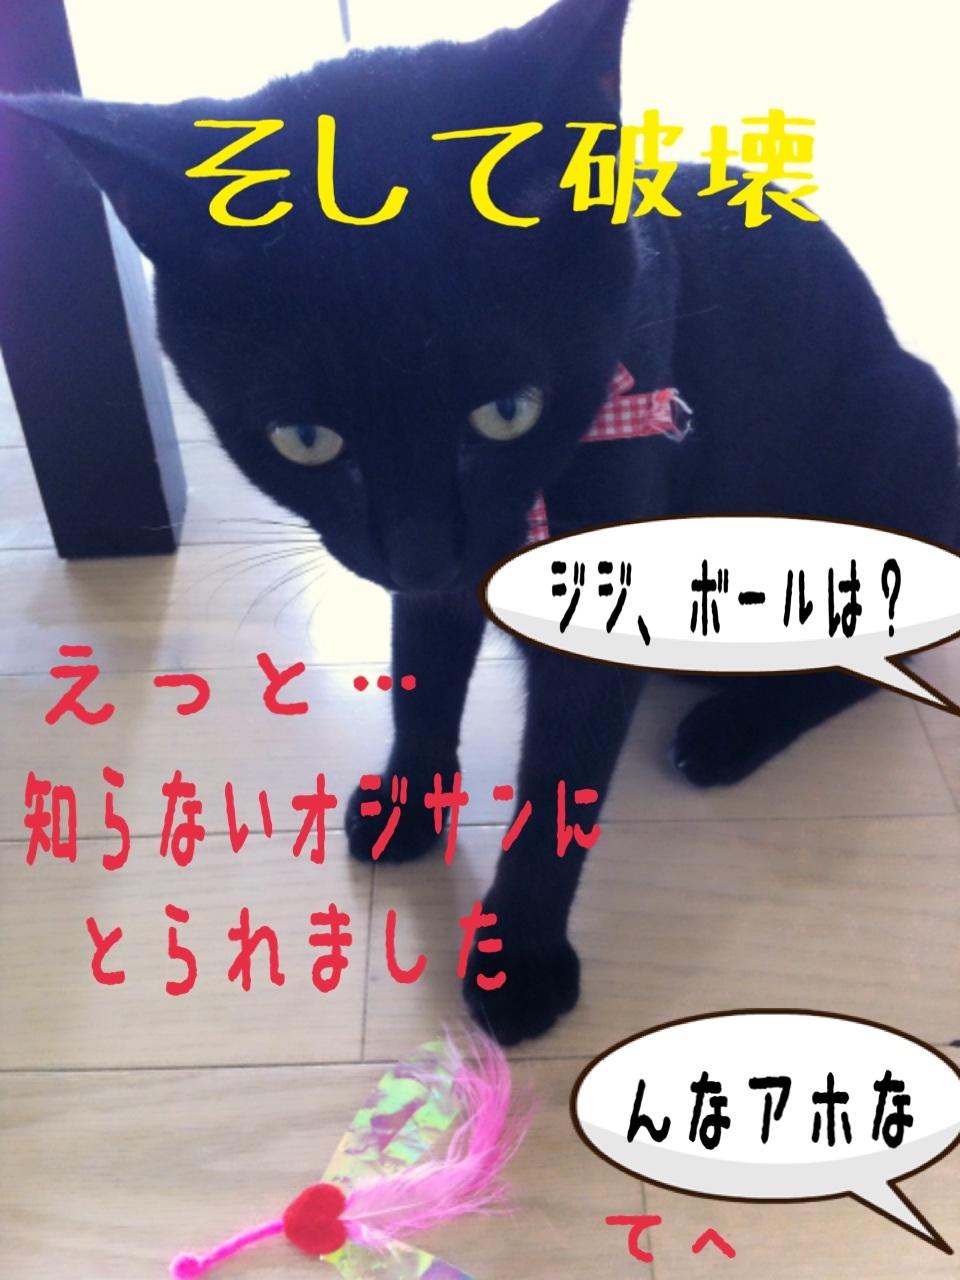 image_20130716230750.jpg